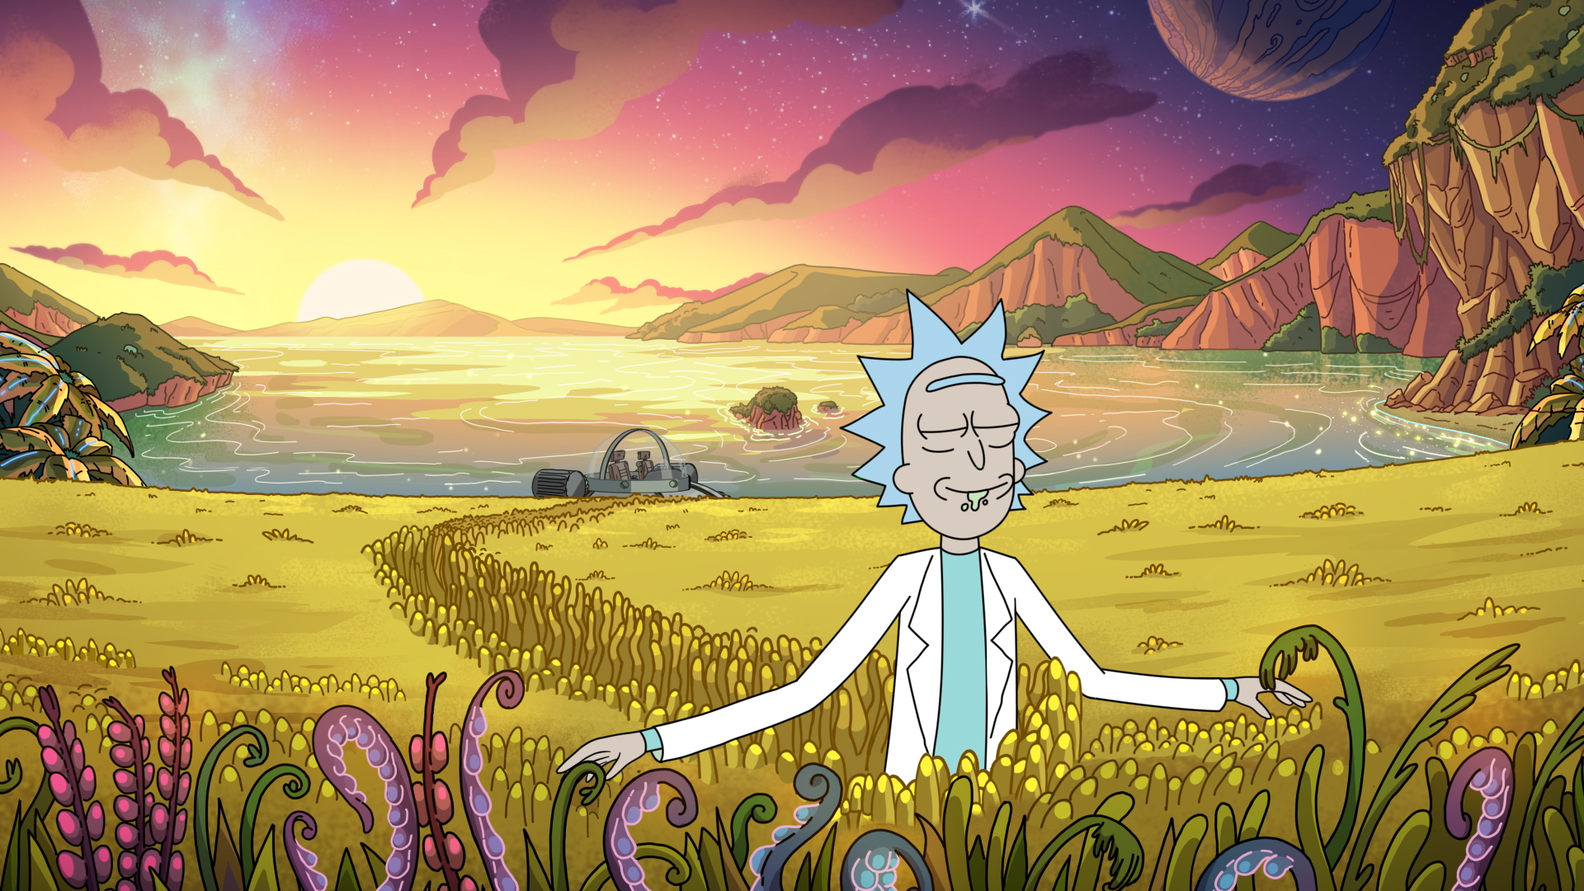 Rick and Morty S4 Image